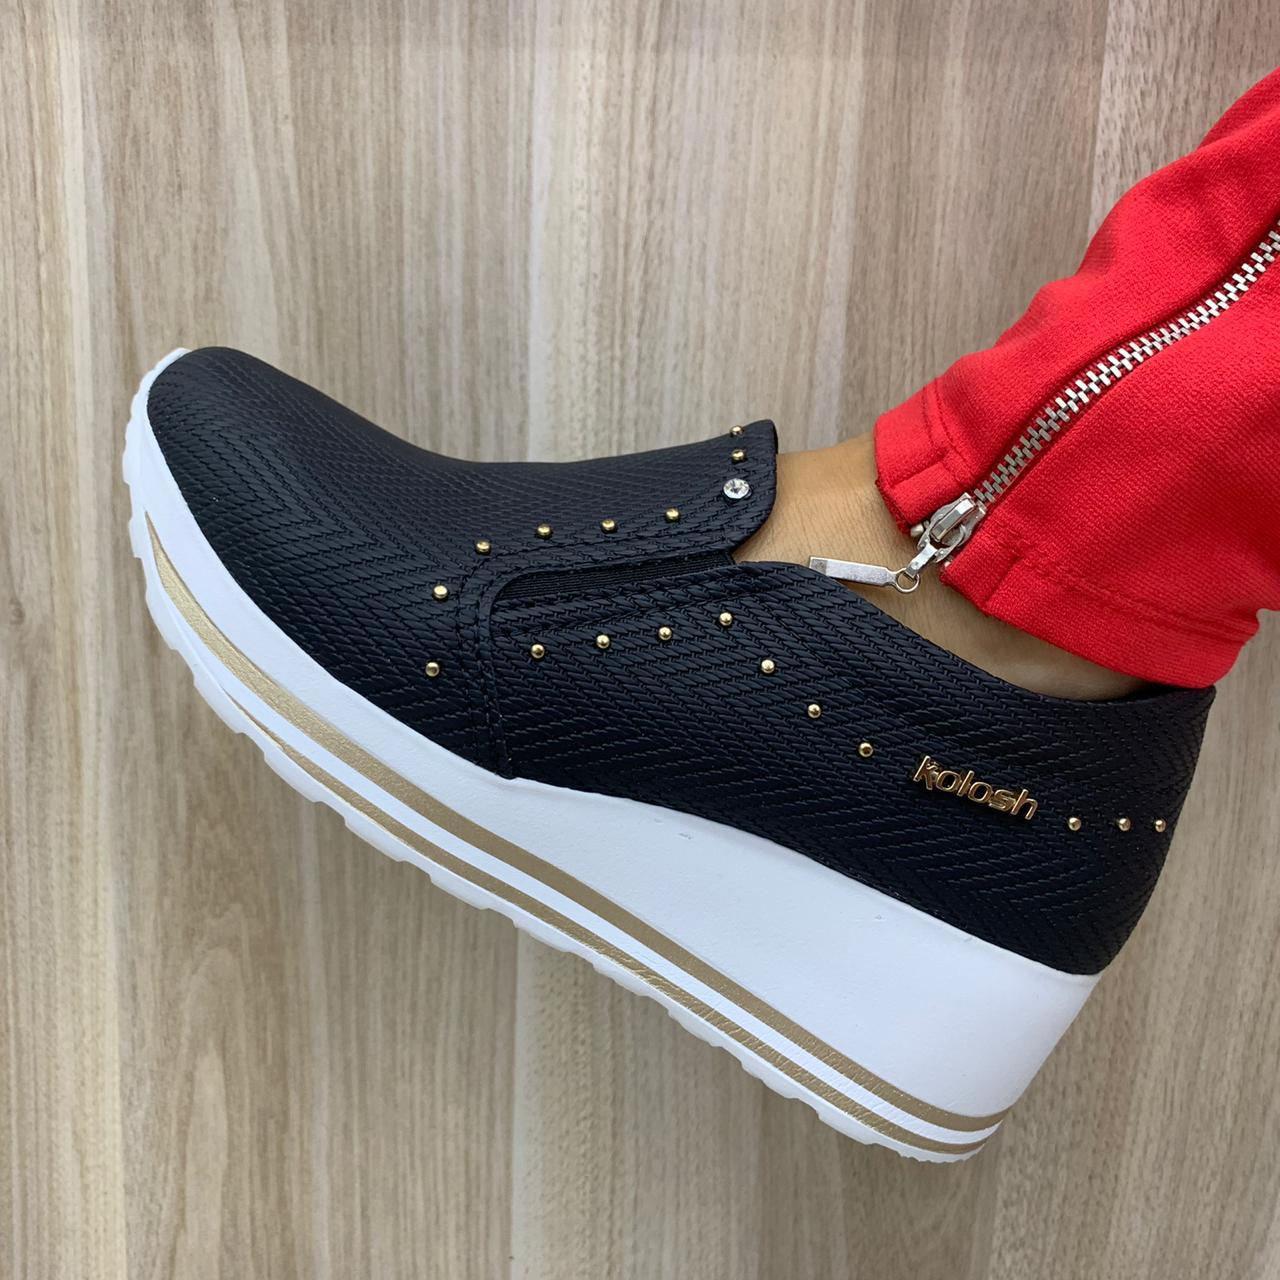 Tênis Kolosh Sneaker Plataforma Anabela Leve C1408 Feminino